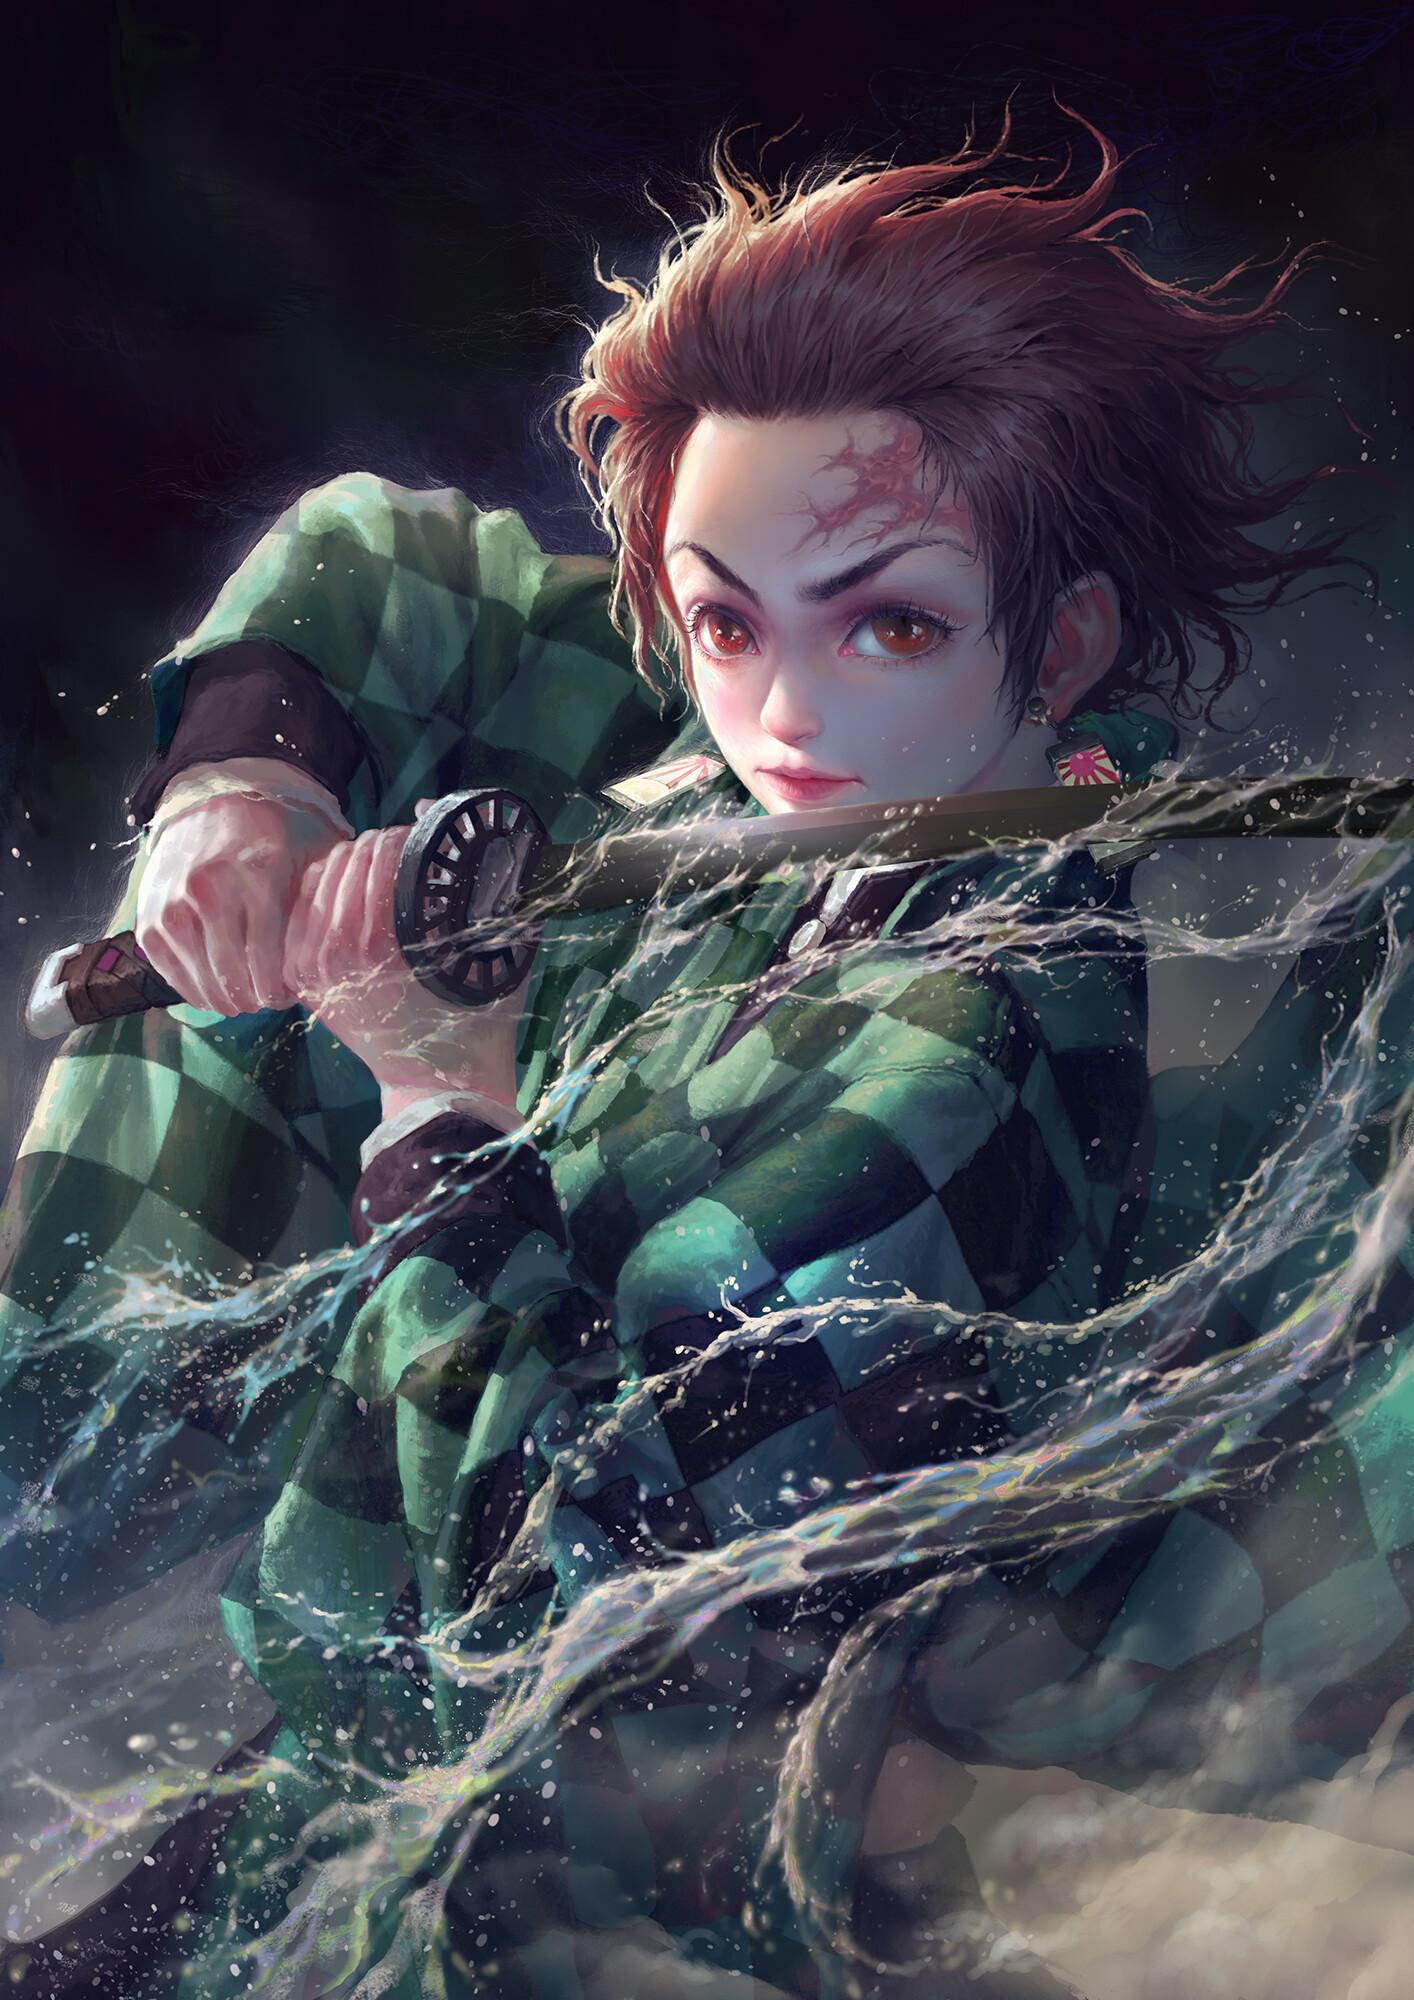 Anime 1414x2000 katana Kimetsu no Yaiba portrait display water digital art digital painting fan art artwork anime drawing Kamado Tanjirō sword dongming yang